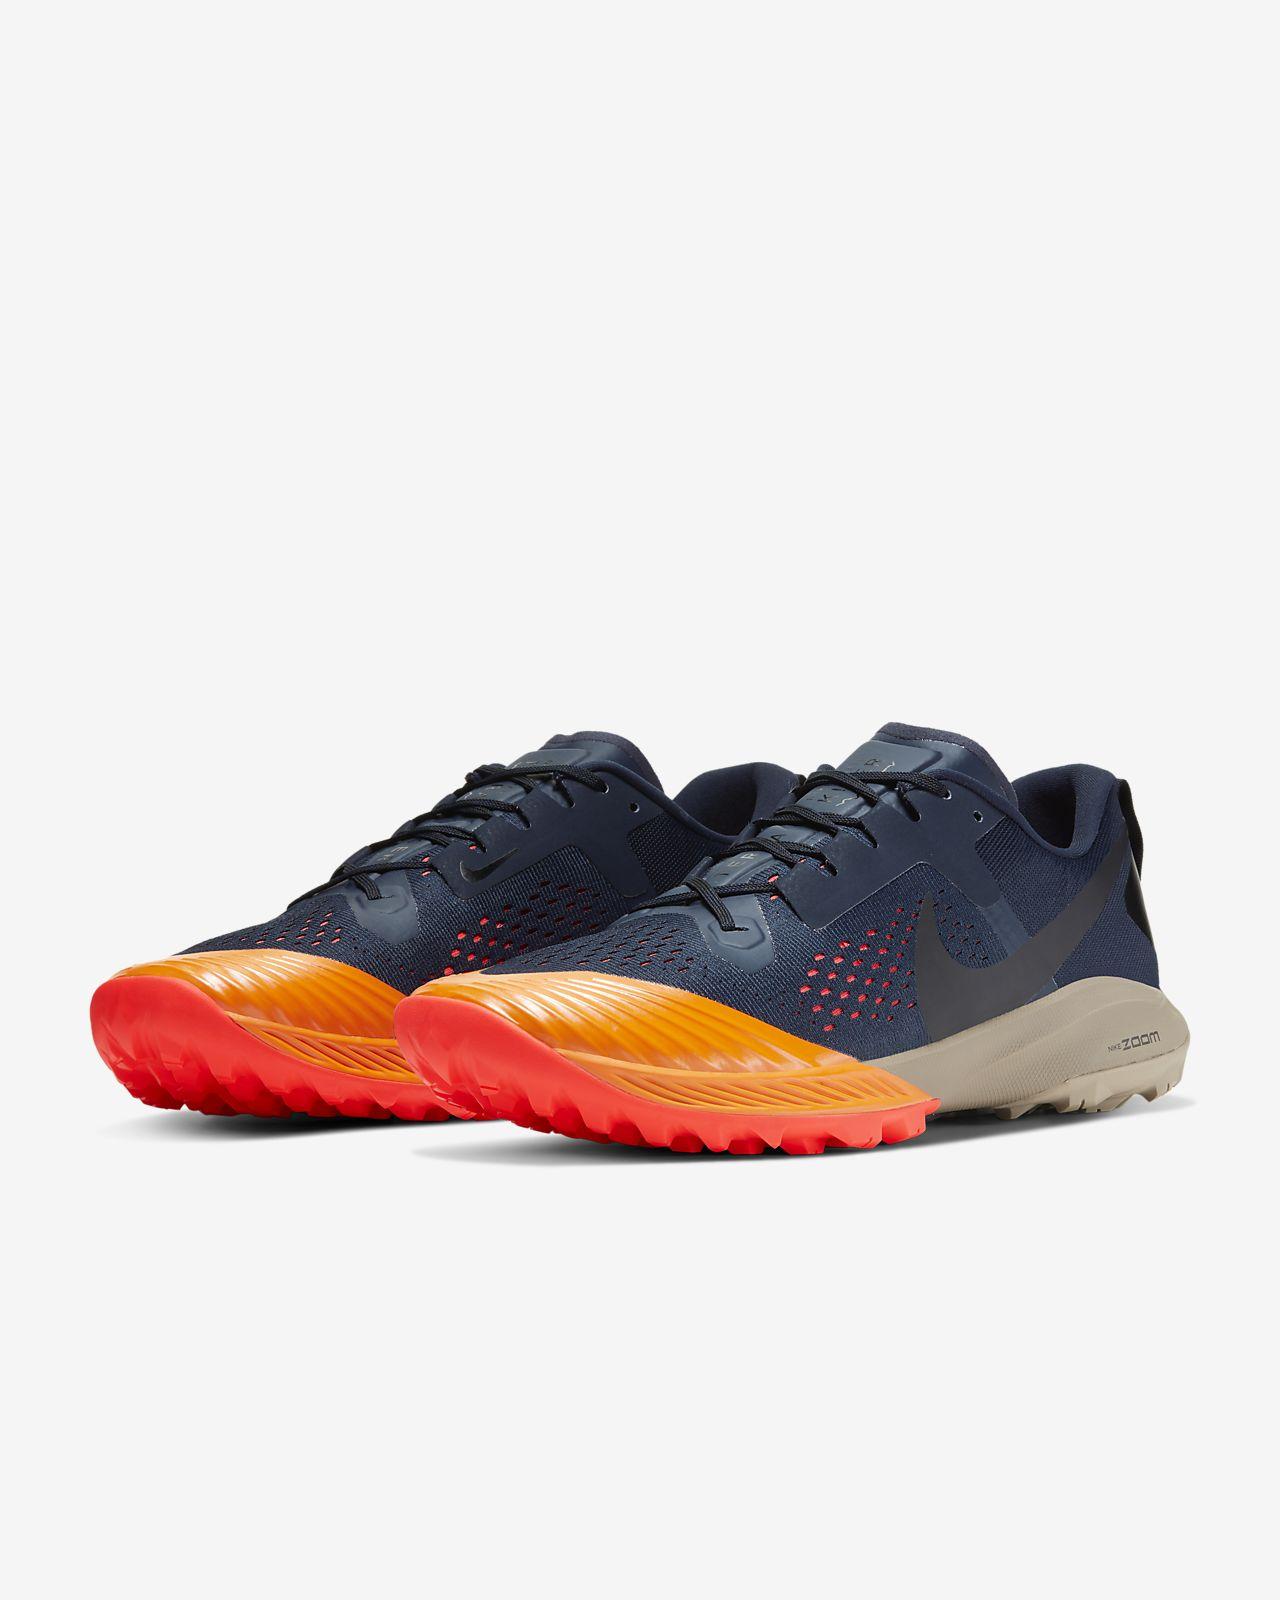 Sapatilhas de trail running de homem Air Zoom Terra Kiger 5 Nike